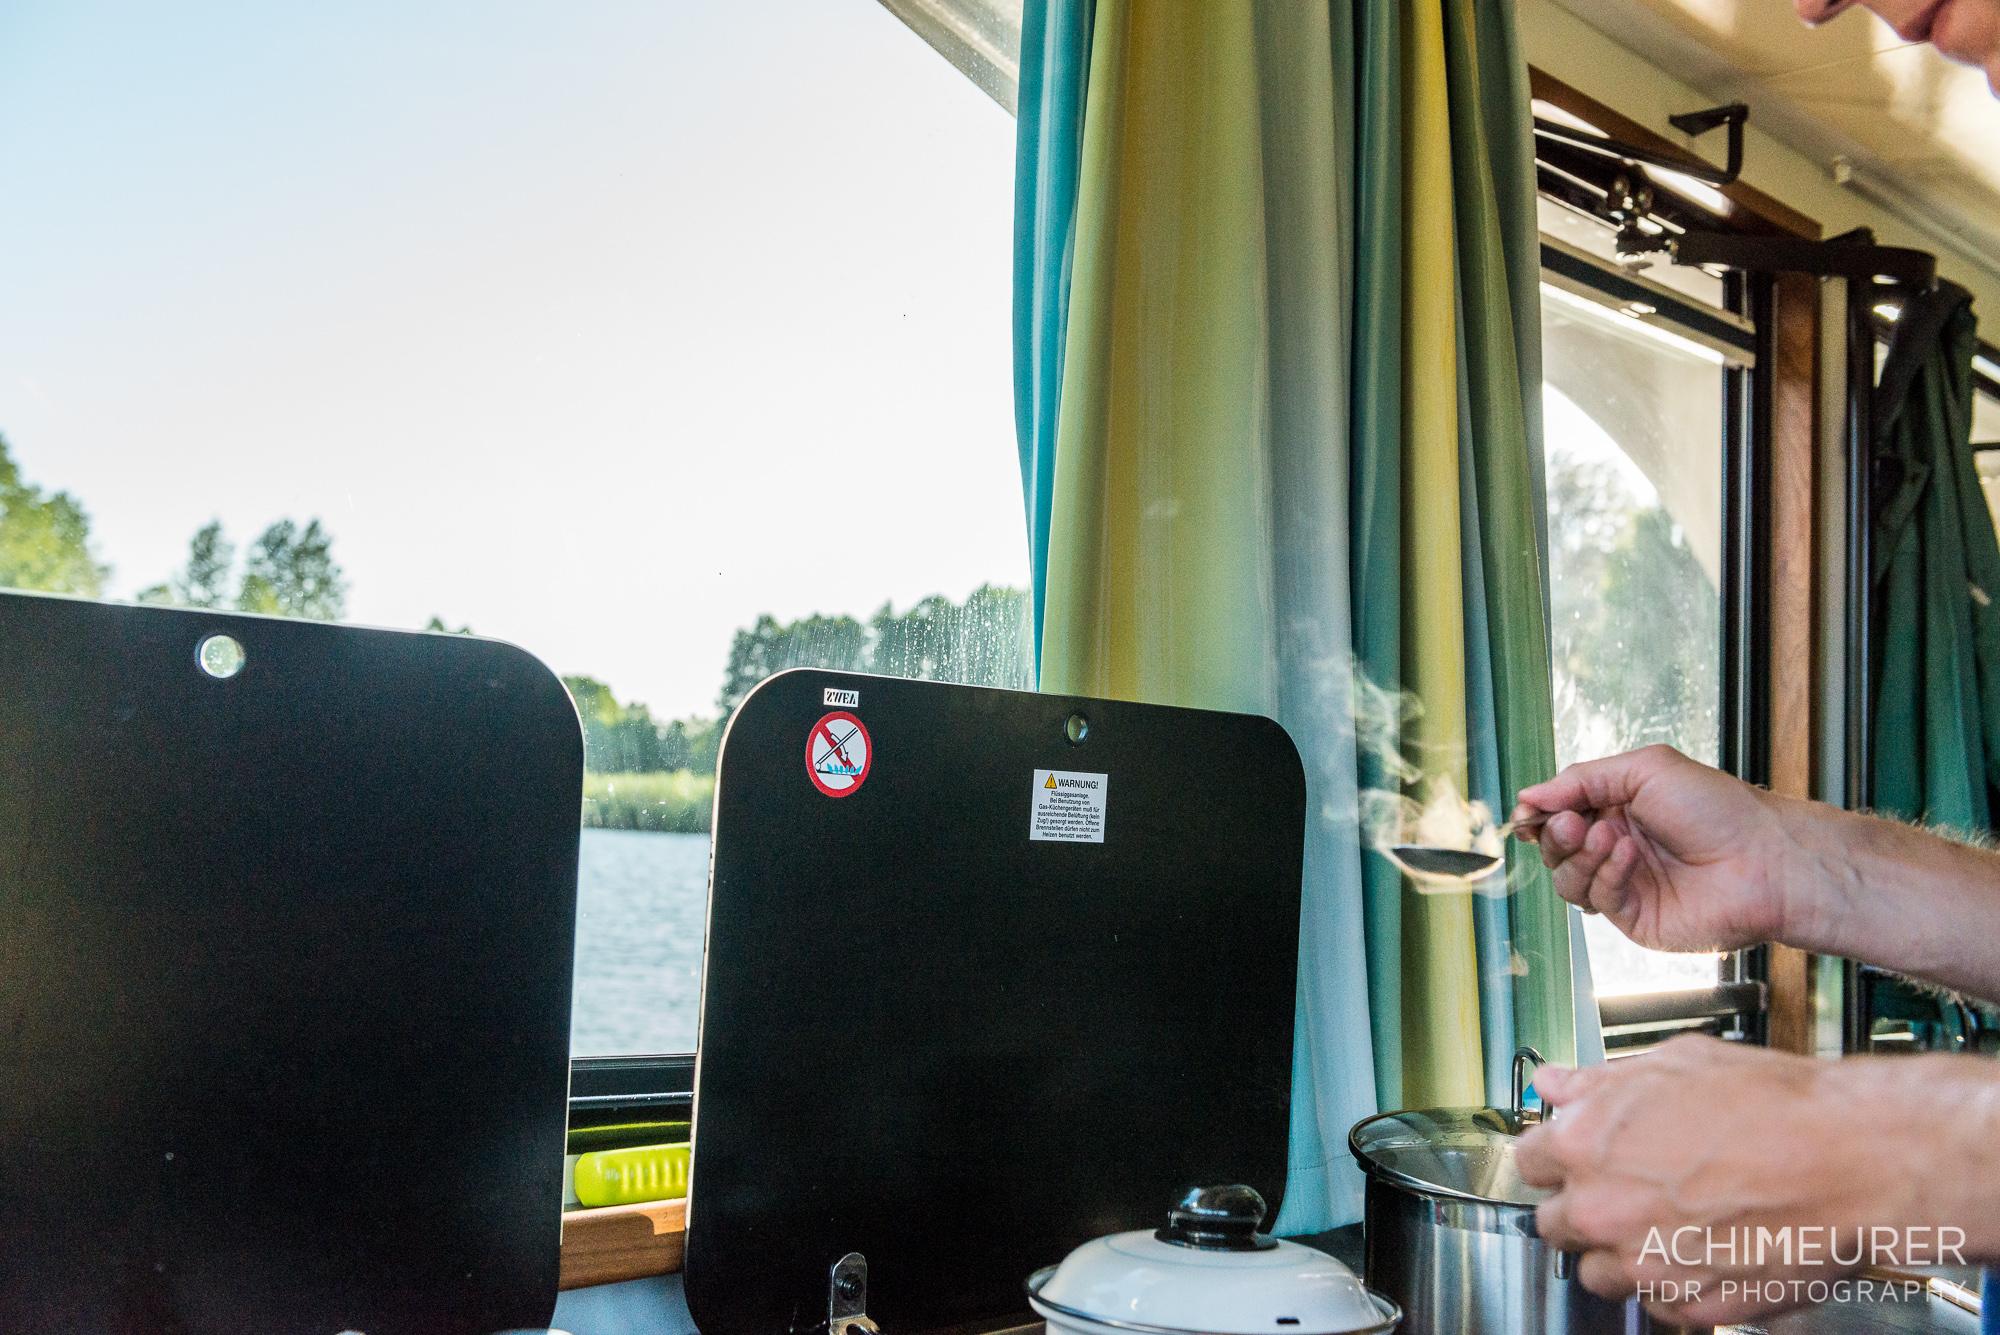 Hausboot-Kuhnle-Mueritz-Mecklenburg-Vorpommern-See_3335